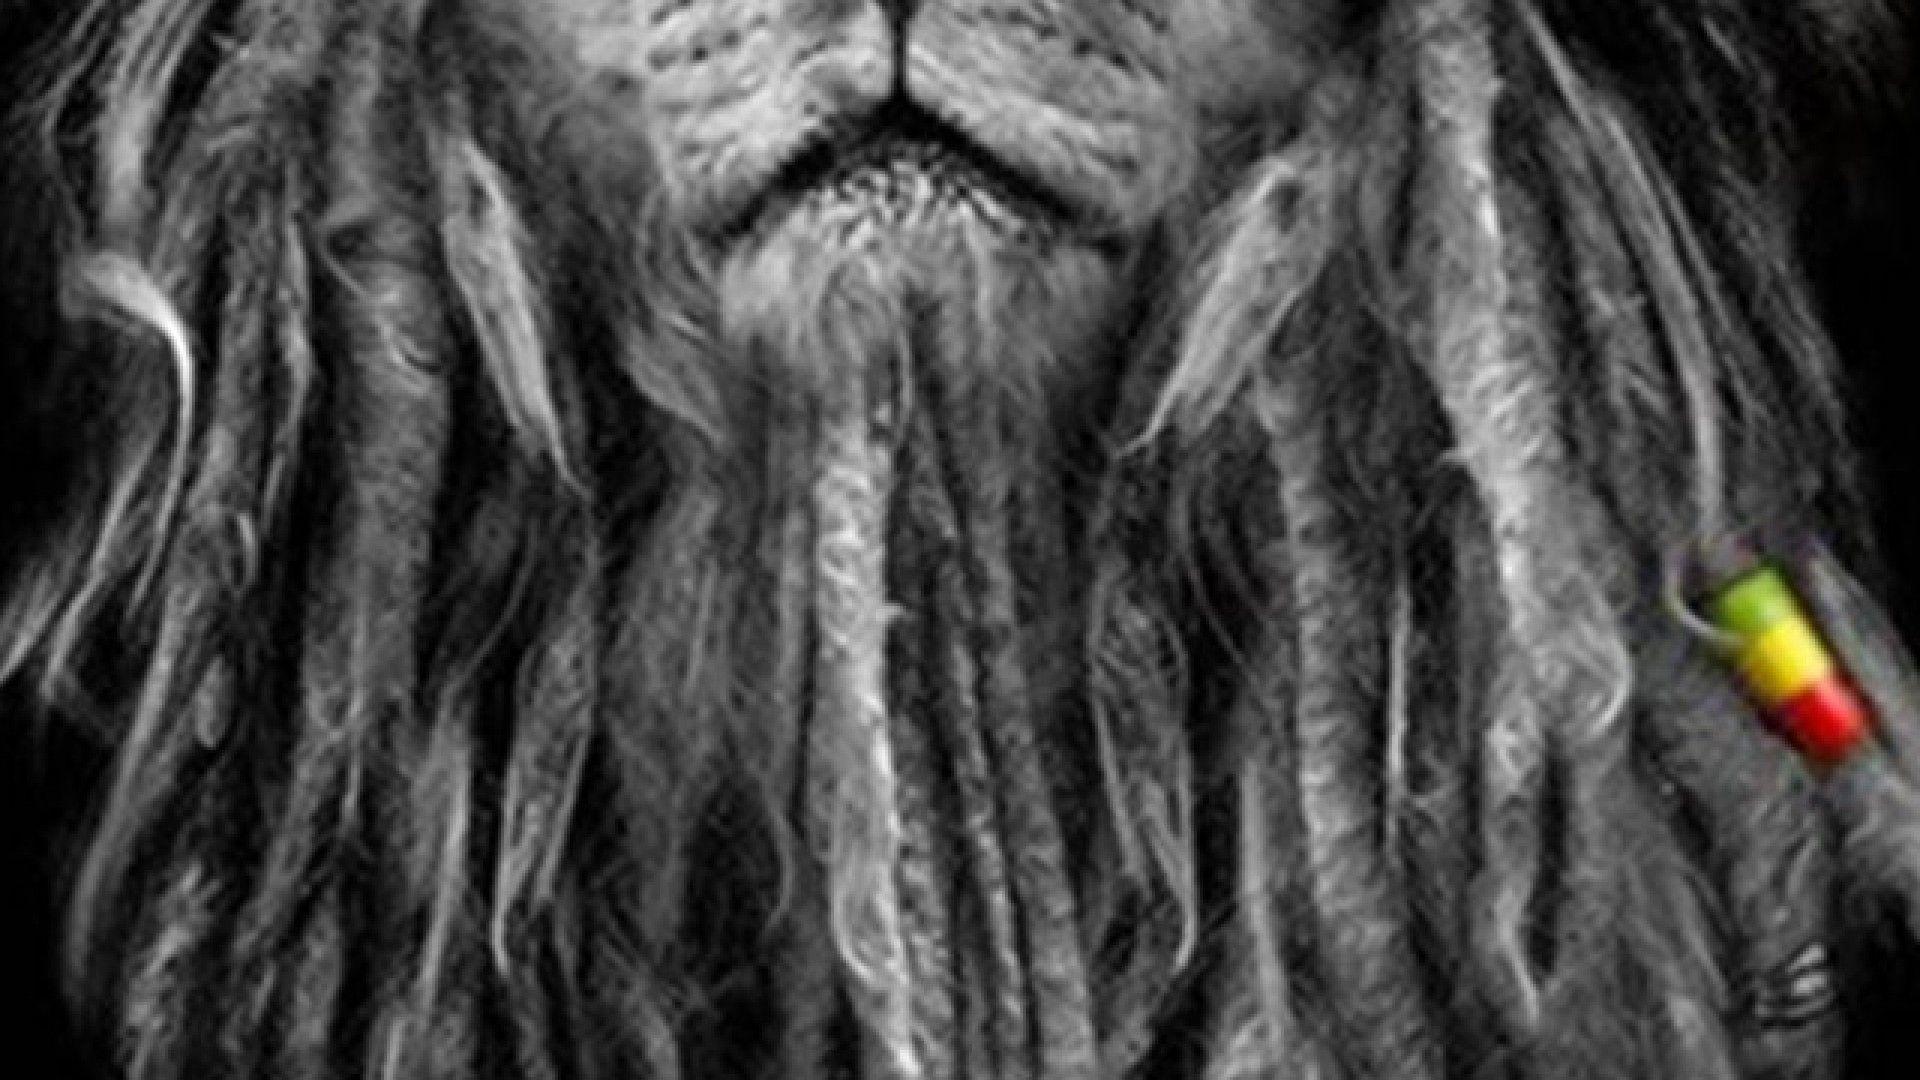 rastafarian lion wallpaper - photo #16